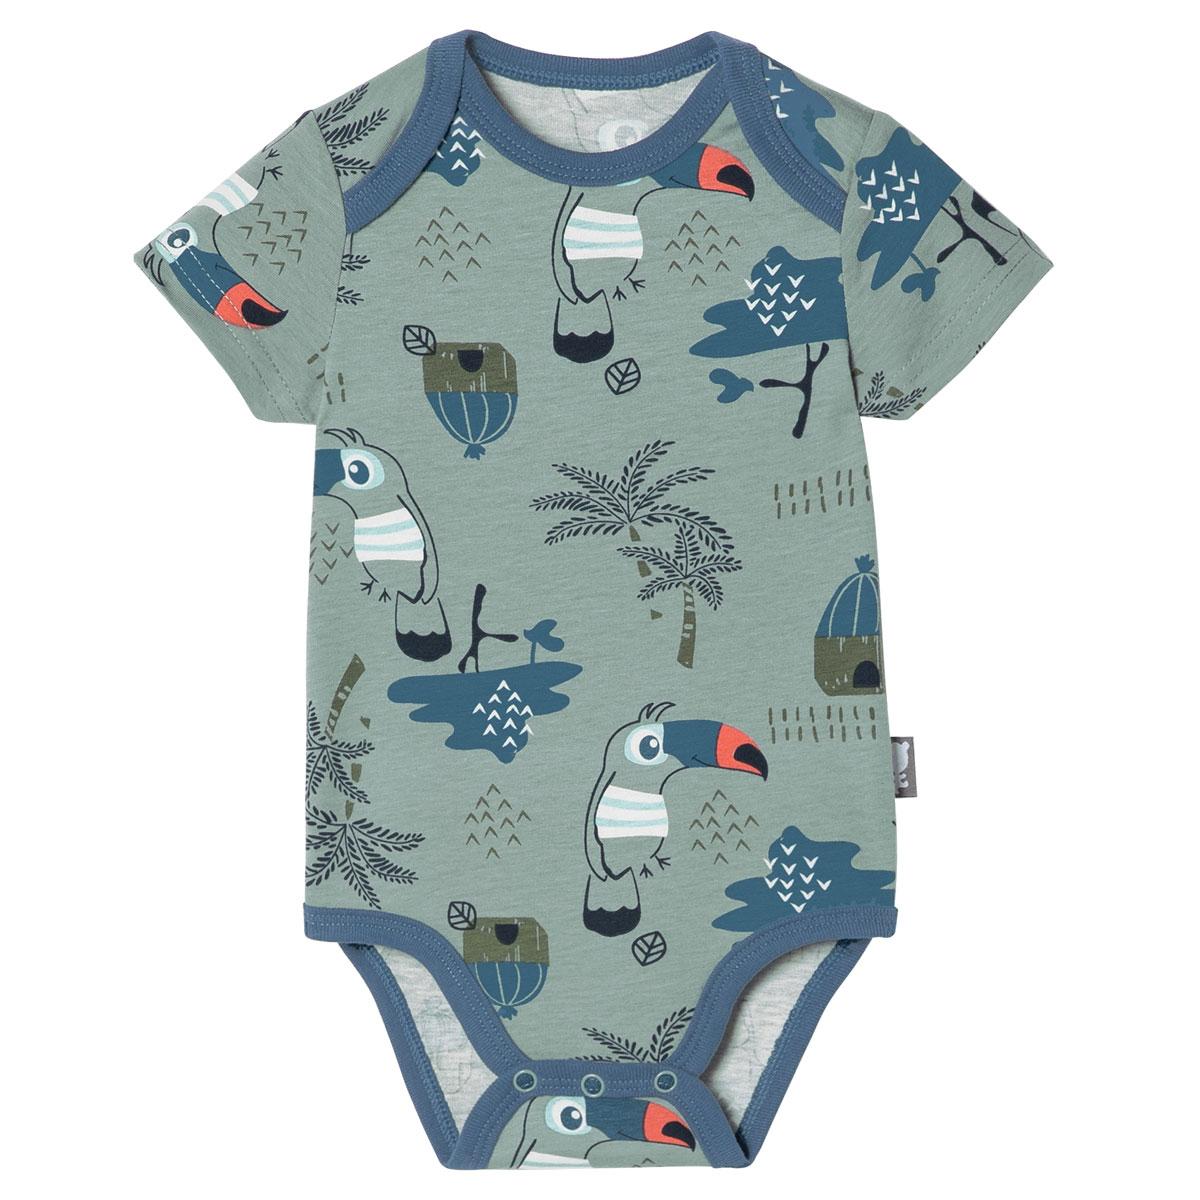 Lot de 2 bodies bébé garçon débardeurs bébé Bora Bora 1